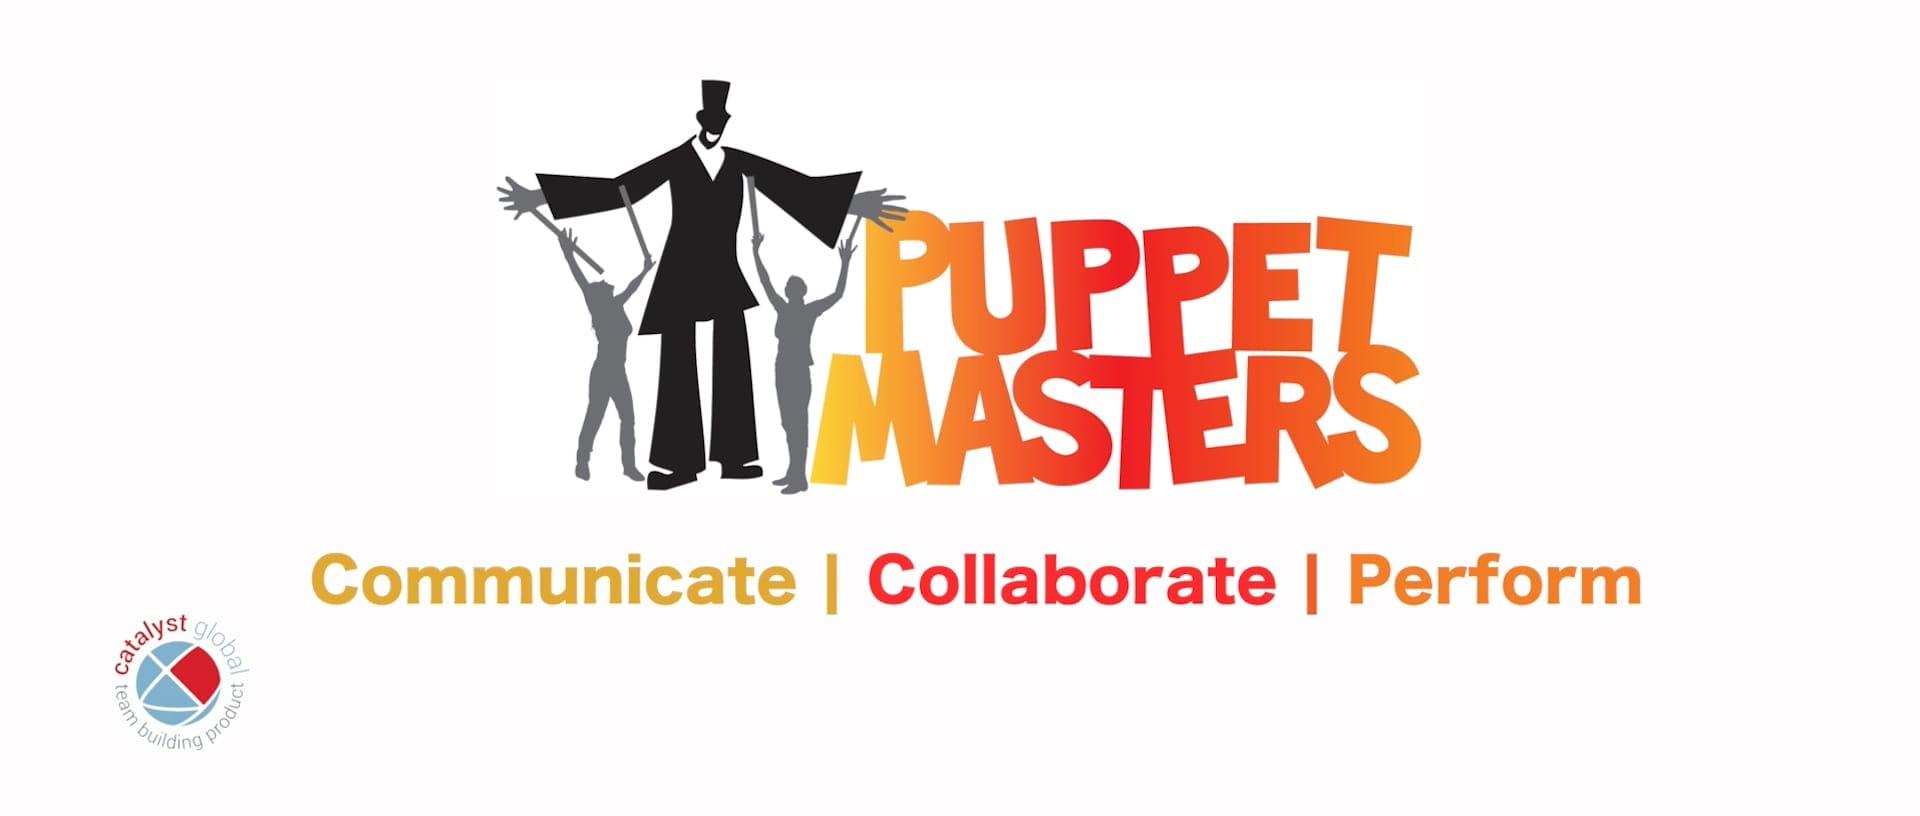 Puppet Masters teambuilding logo